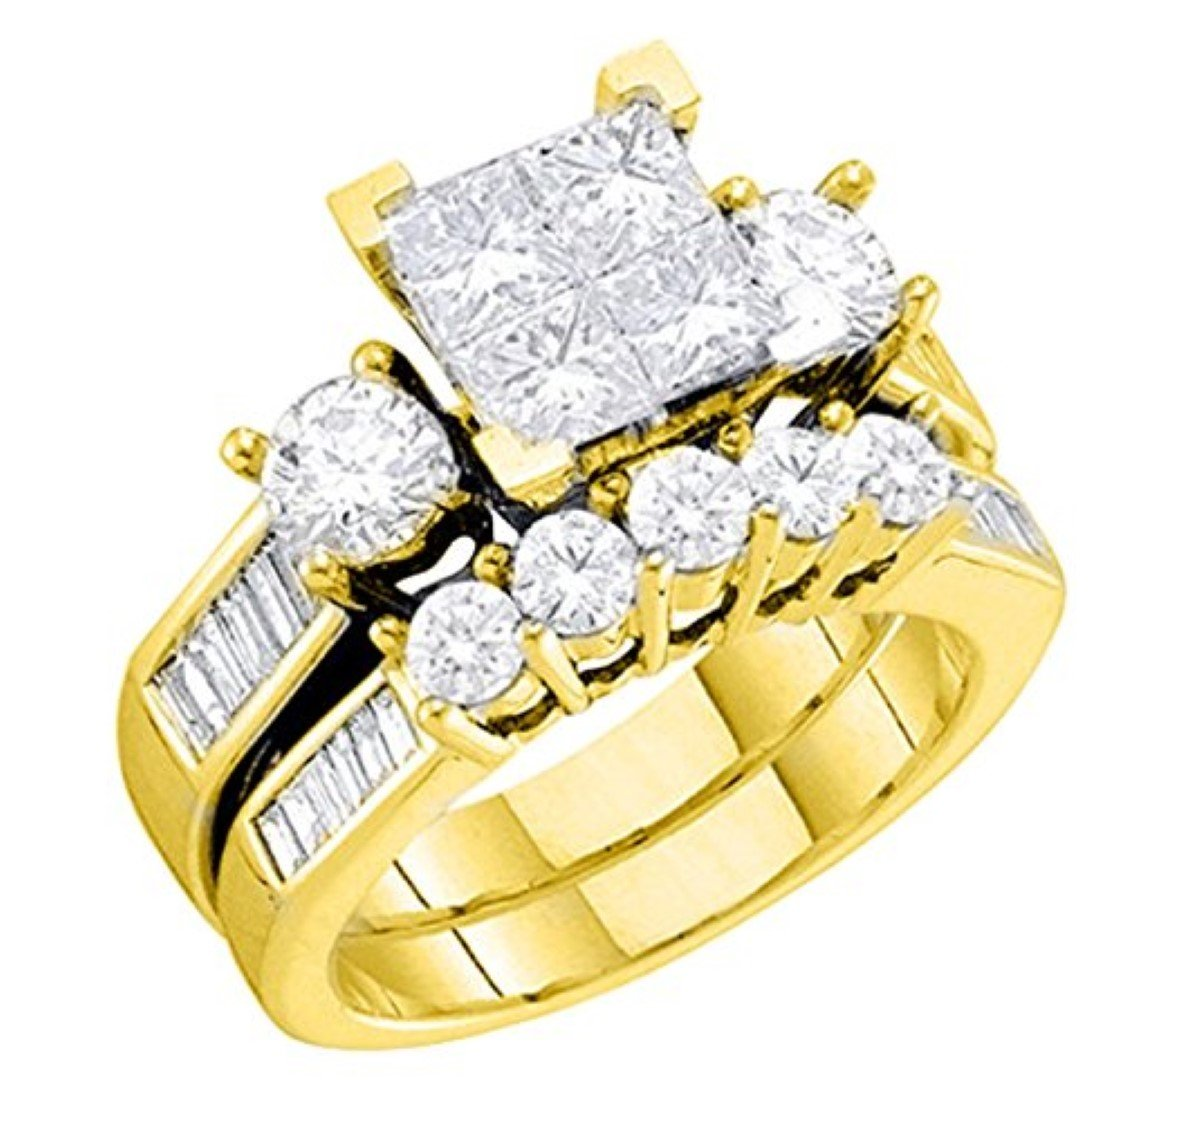 Diamond Brida10K White Gold Engagement Ring / Wedding Ring Set Princess Cut White Gold 10k 2pc Set (1.00cttw, i2/i3, I/j) (yellow-gold, 10) by Midwest Jewellery